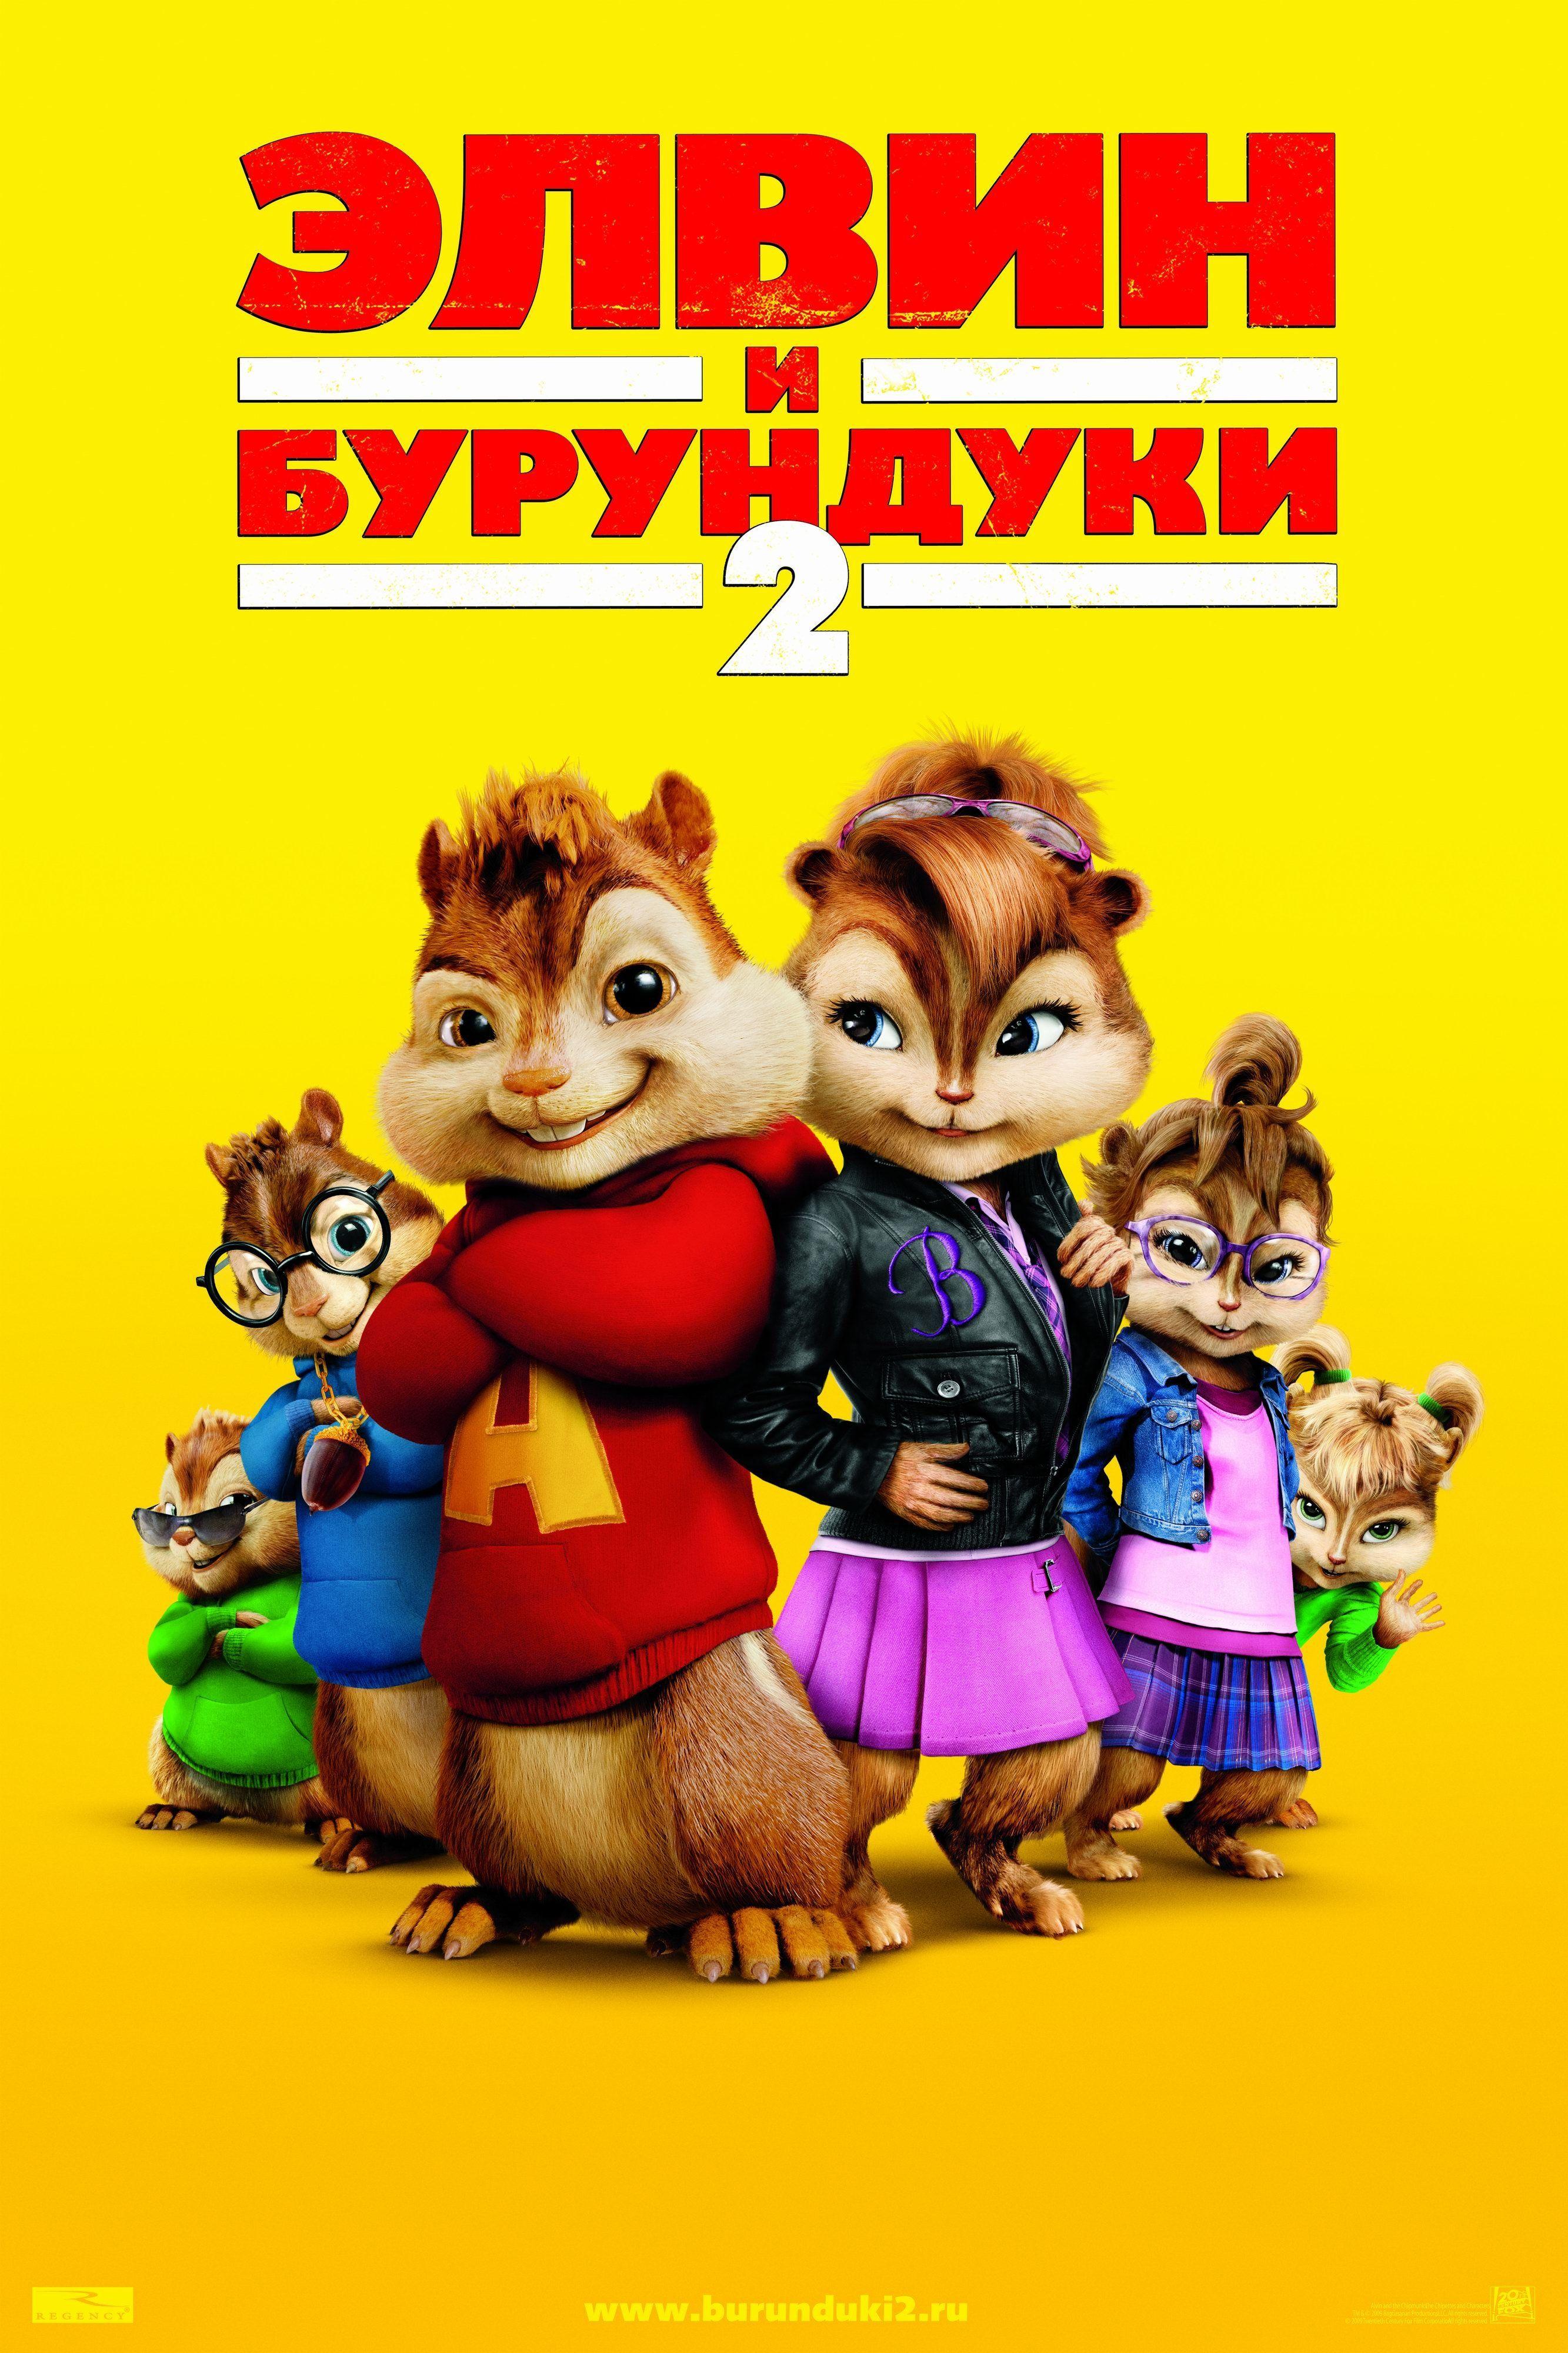 Alvin & The Chipmunks: The Squeakquel\